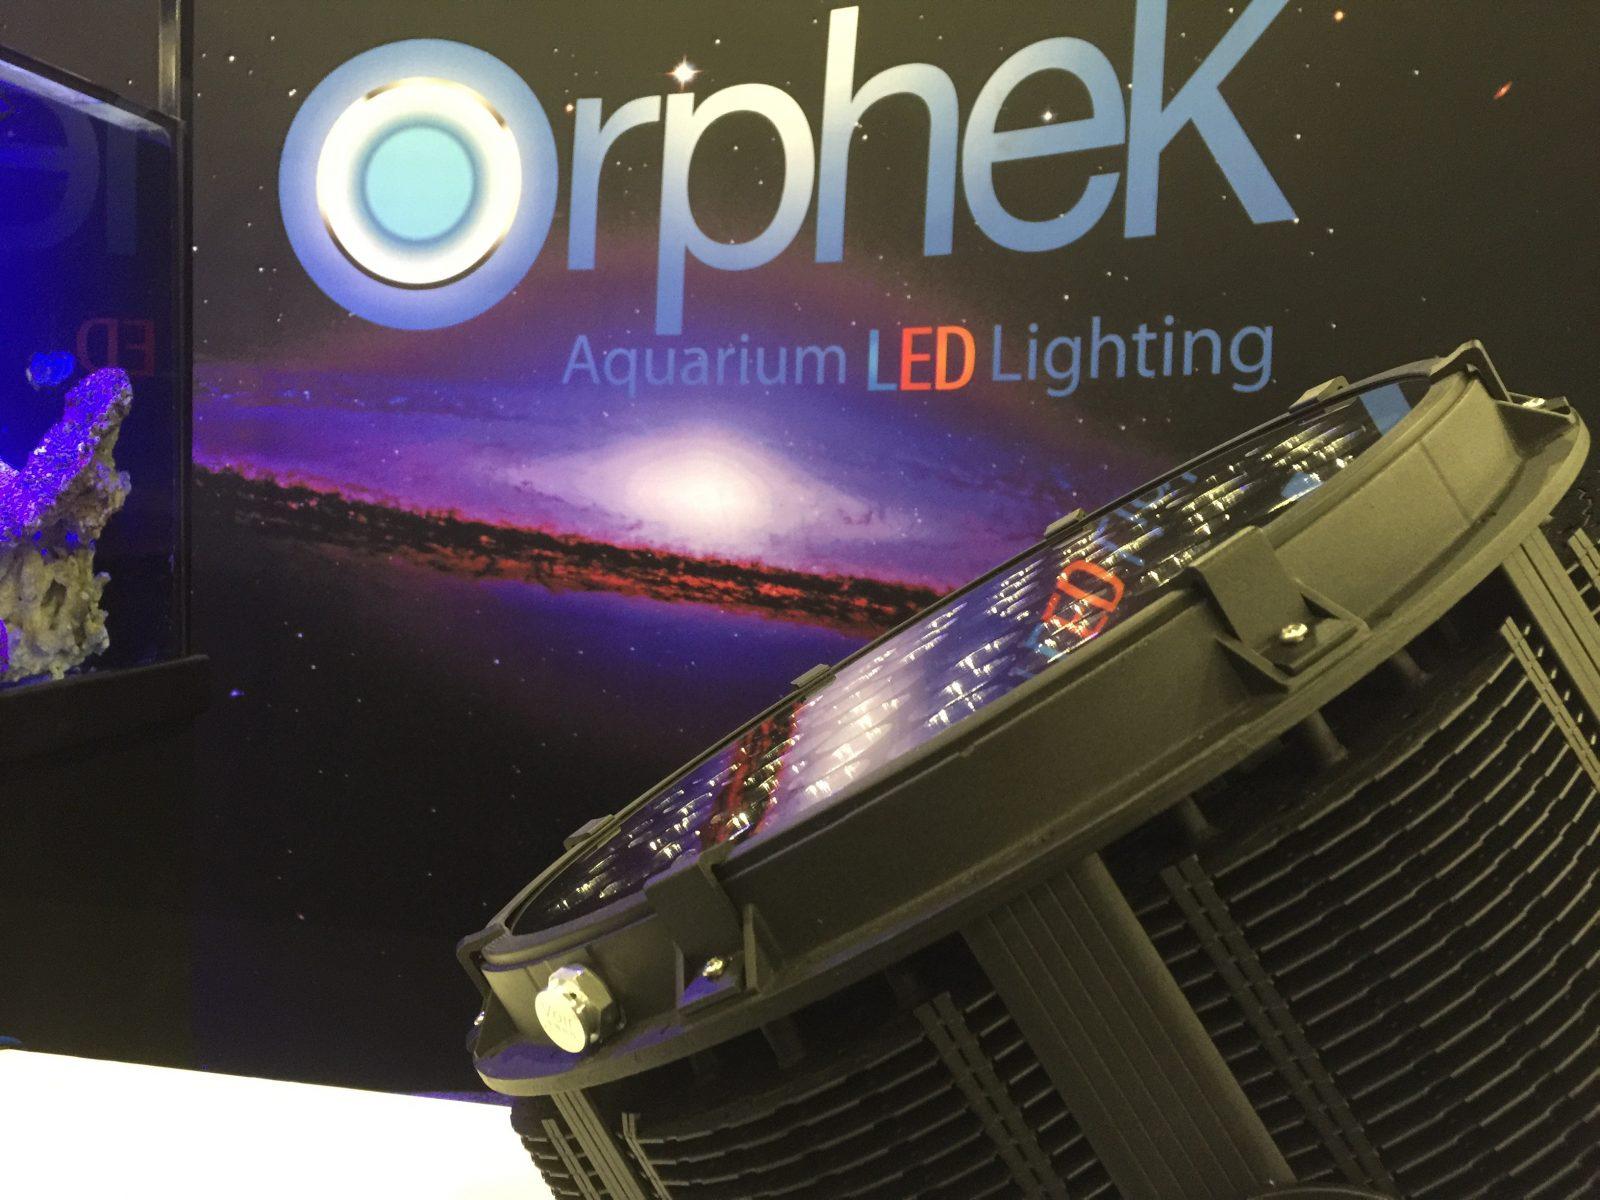 Amazonas 500 Watt LED-Beleuchtung • Orphek Aquarium LED-Beleuchtung